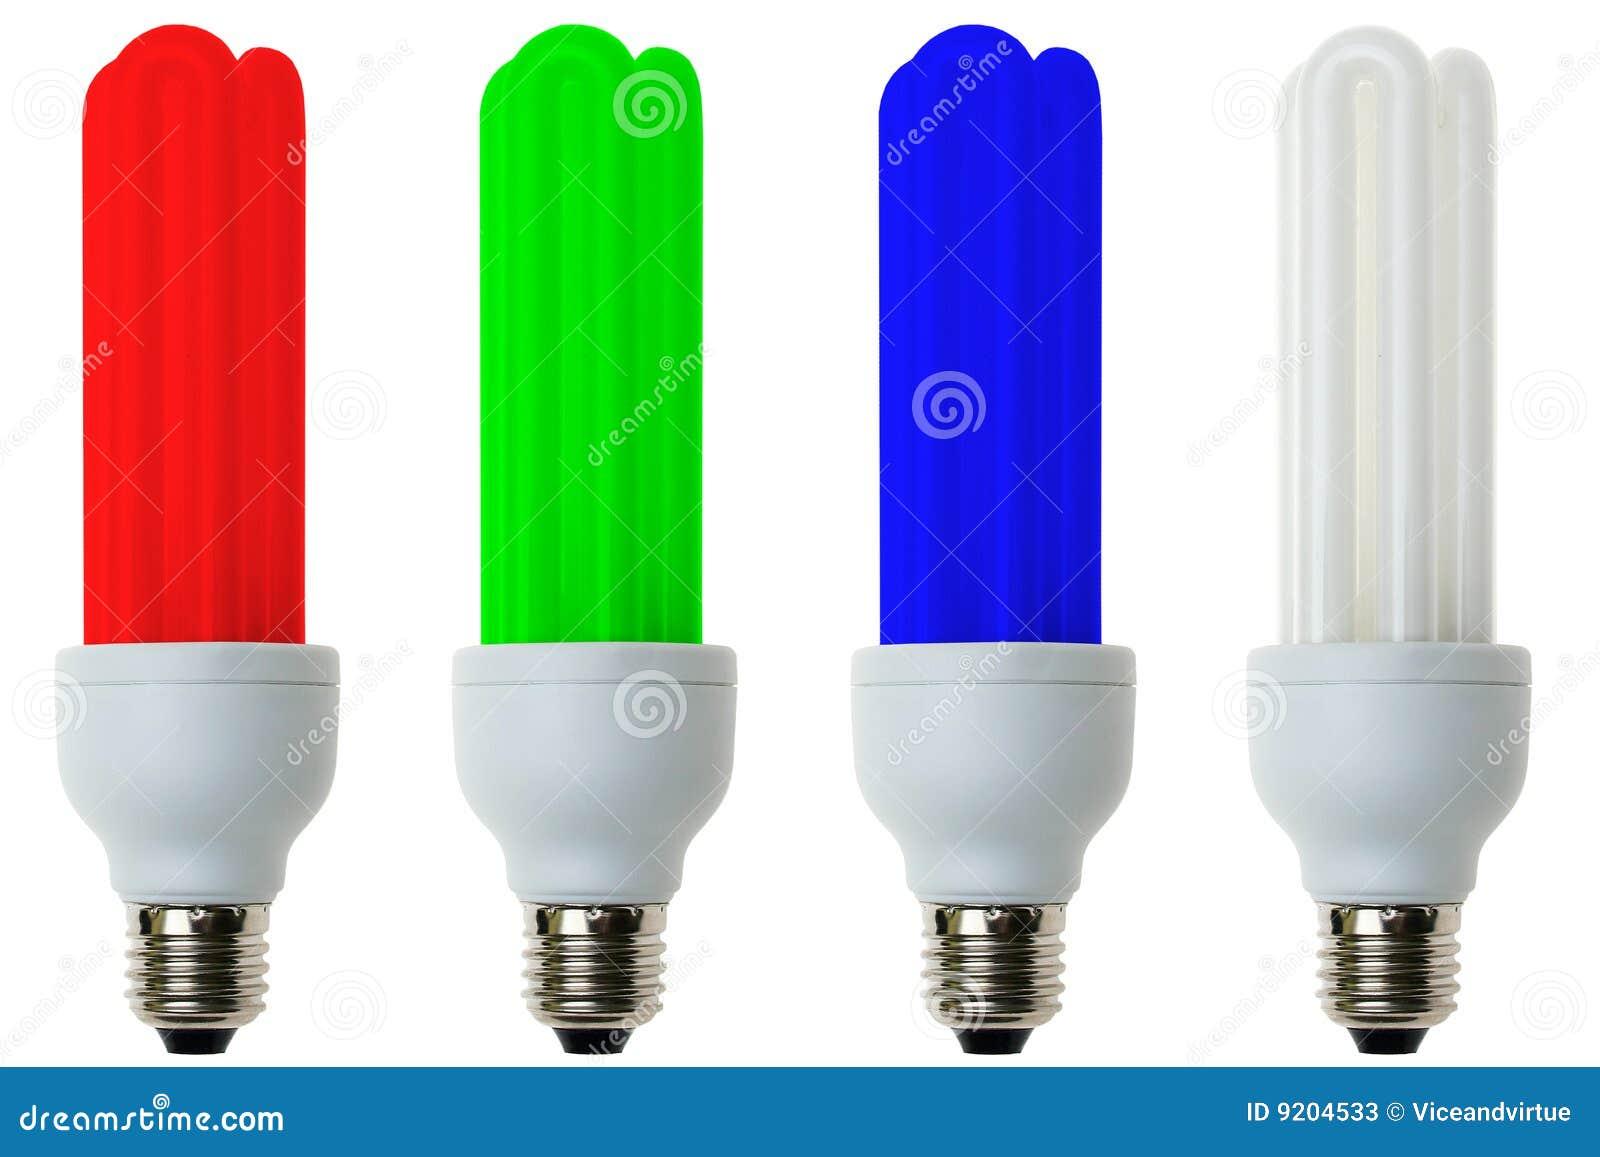 colored fluorescent light bulbs rgb fluorescent light bulbs. Black Bedroom Furniture Sets. Home Design Ideas